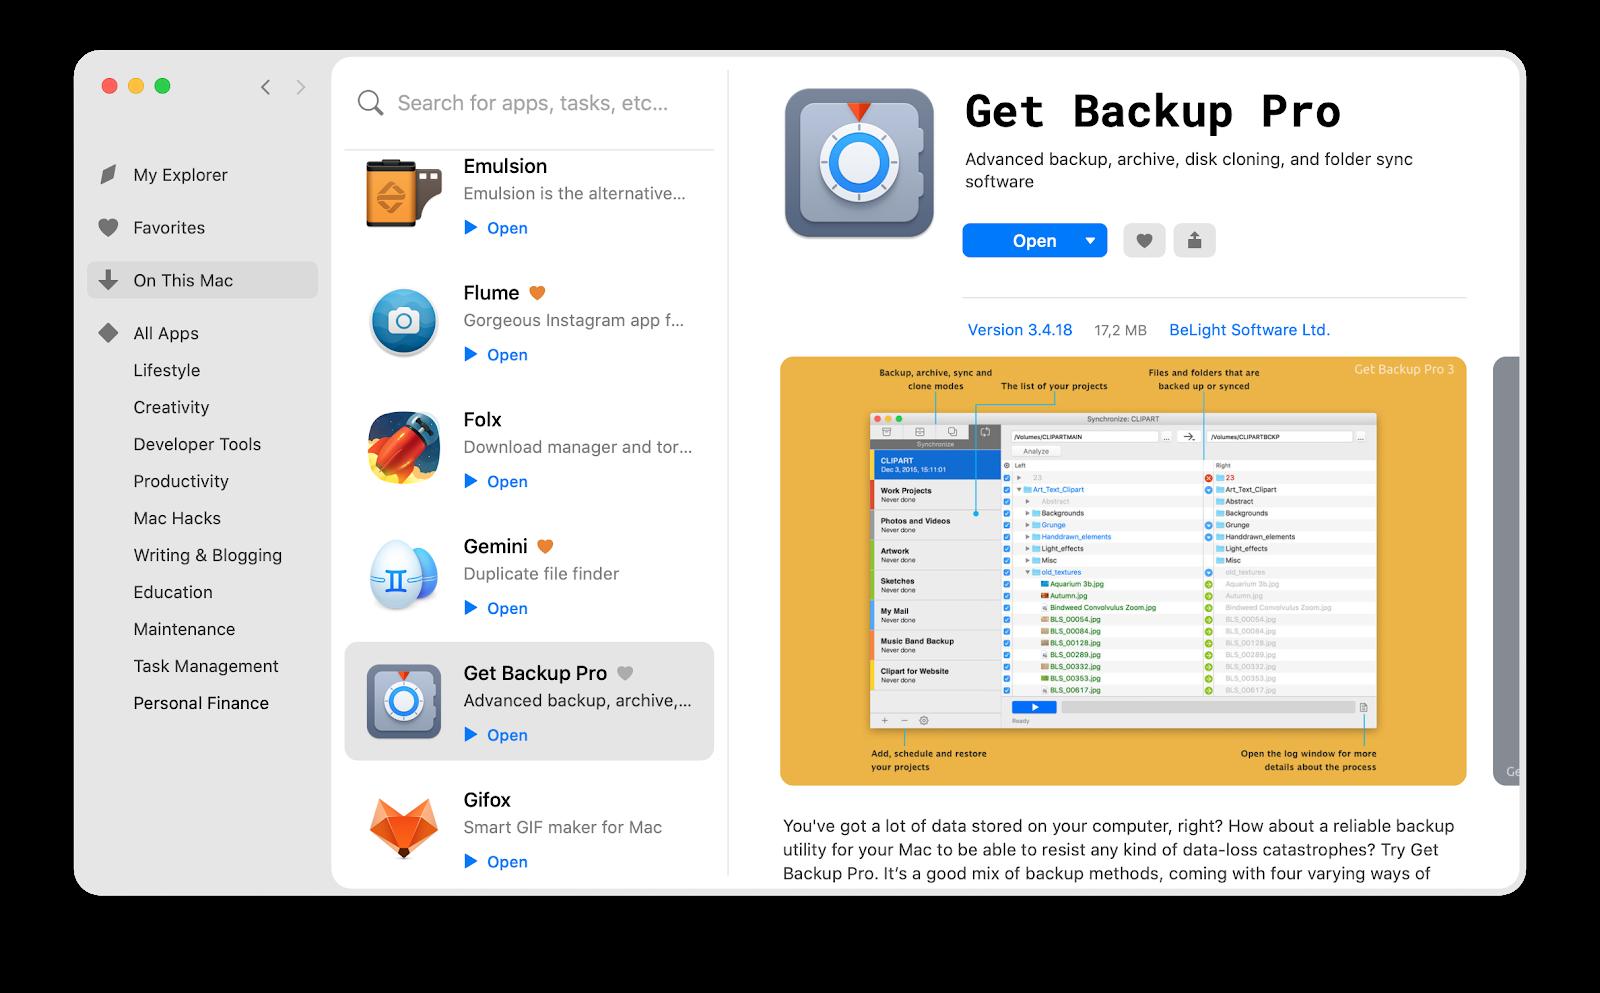 Clean install macOS 10.15 Catalina on Mac.